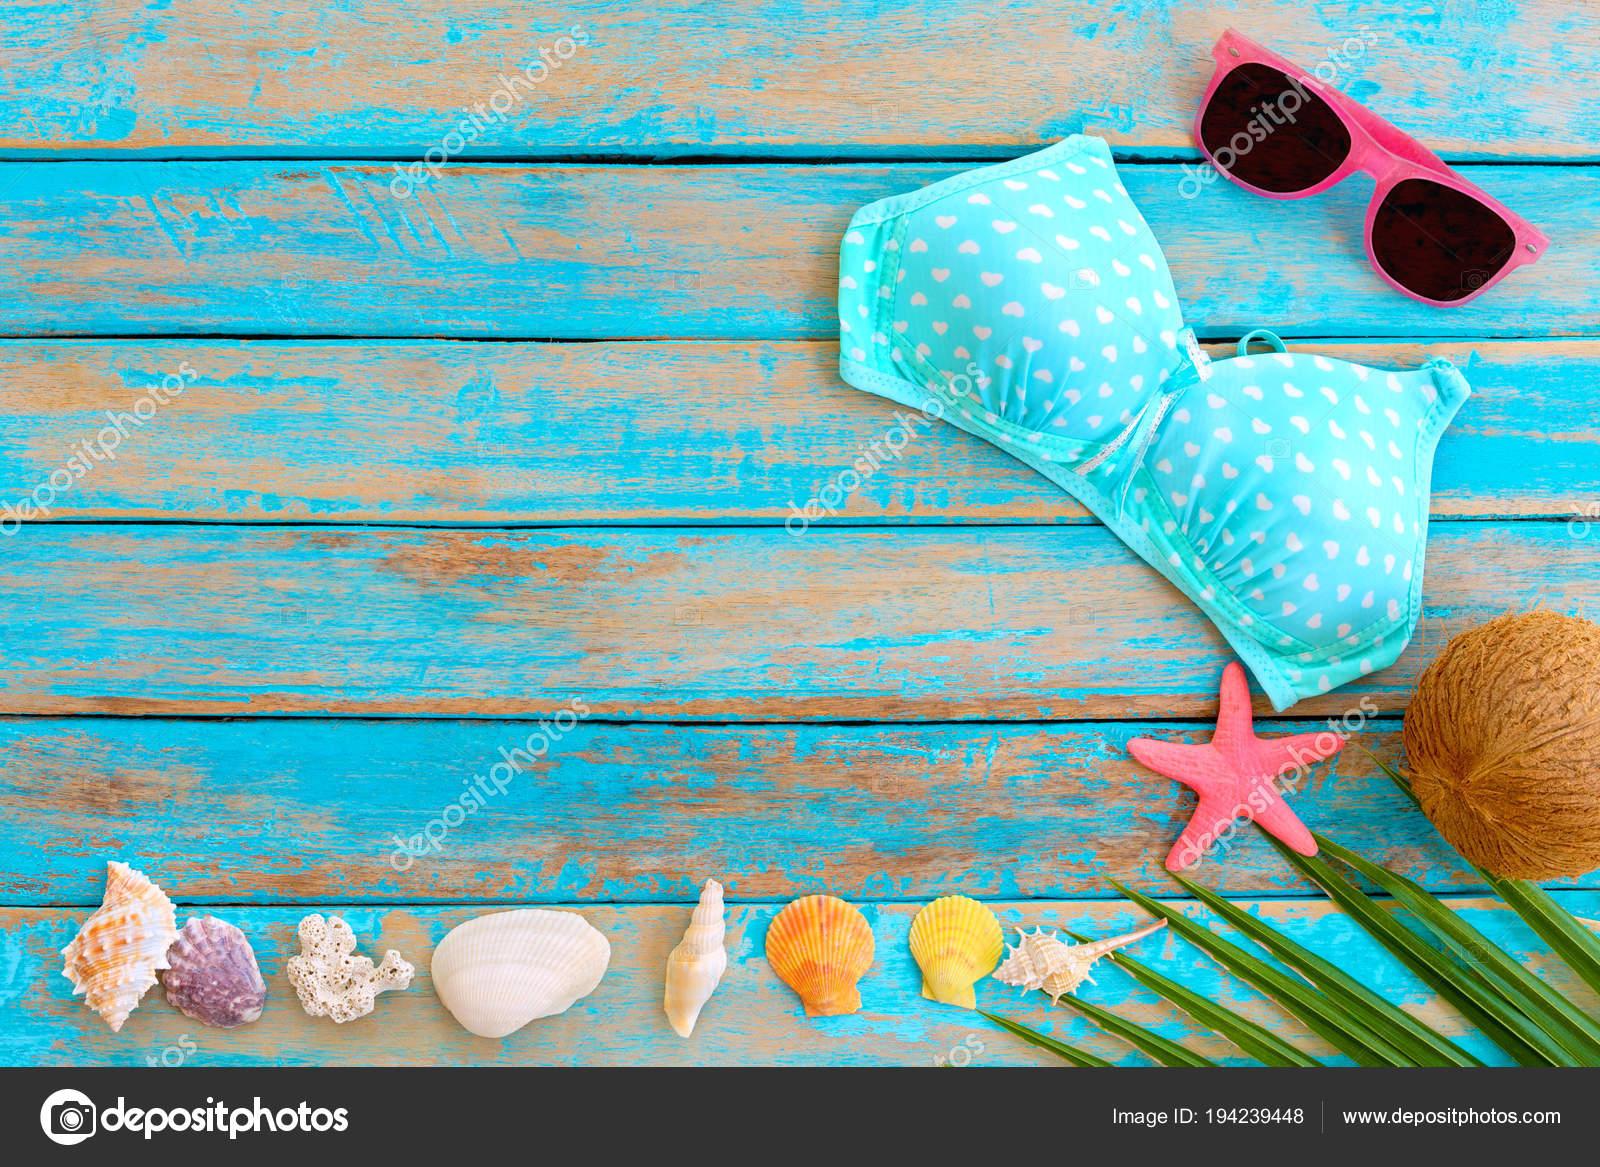 721c7c80fd Φόντο Καλοκαίρι Μπικίνι Γυαλιά Ηλίου Καρύδα Αστερίες Κοράλλια Και Κοχύλια — Φωτογραφία  Αρχείου